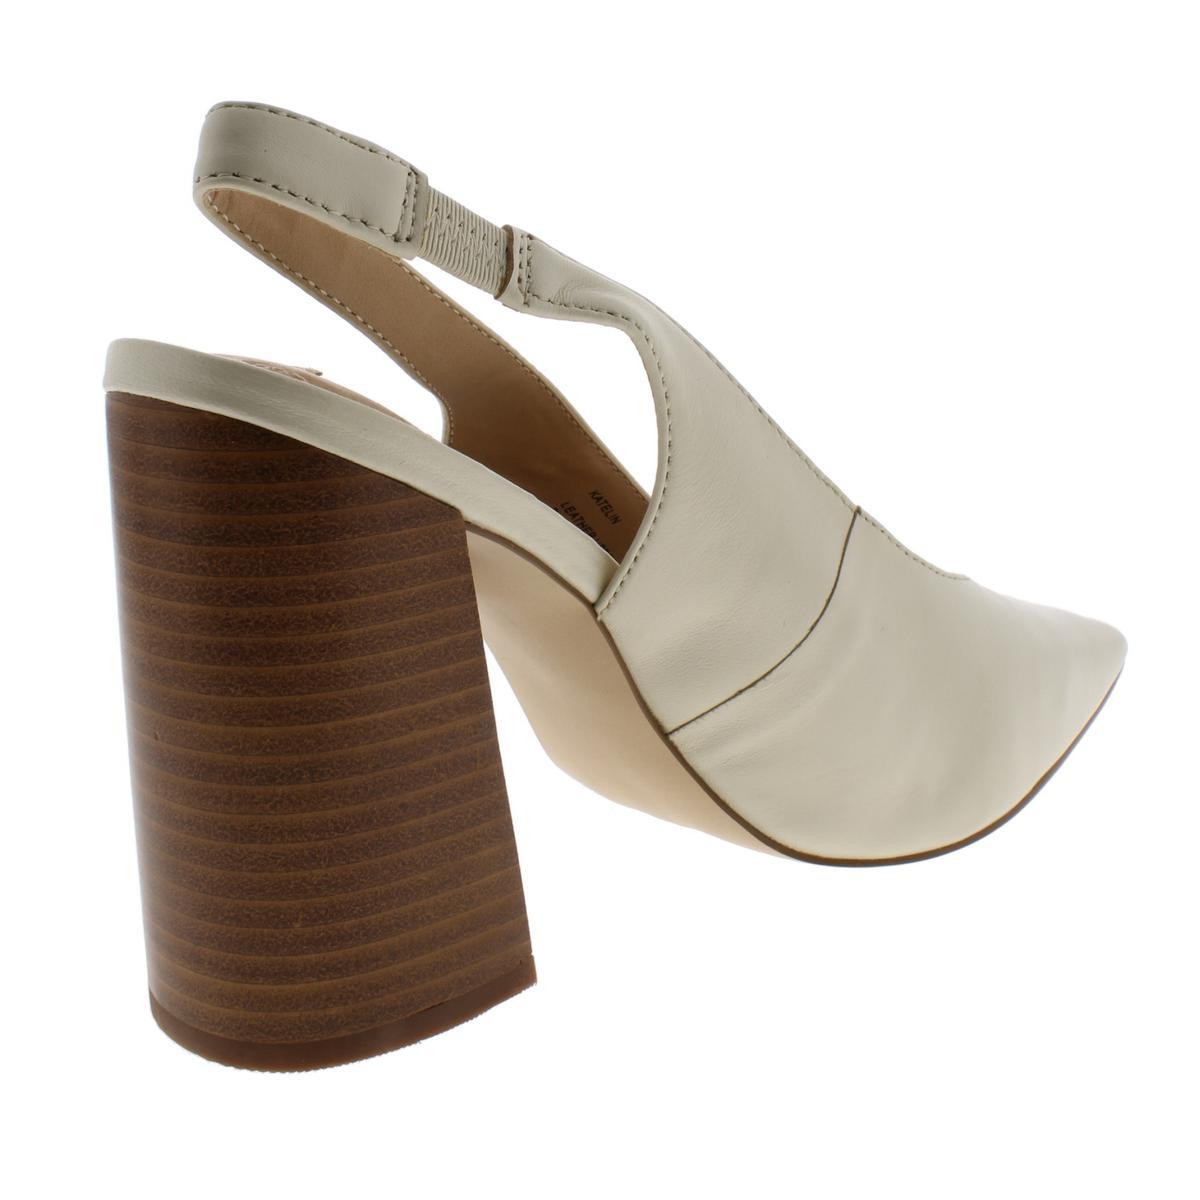 Steve-Madden-Womens-Katelin-Leather-Pointed-Toe-Slingback-Heels-Shoes-BHFO-3798 thumbnail 7